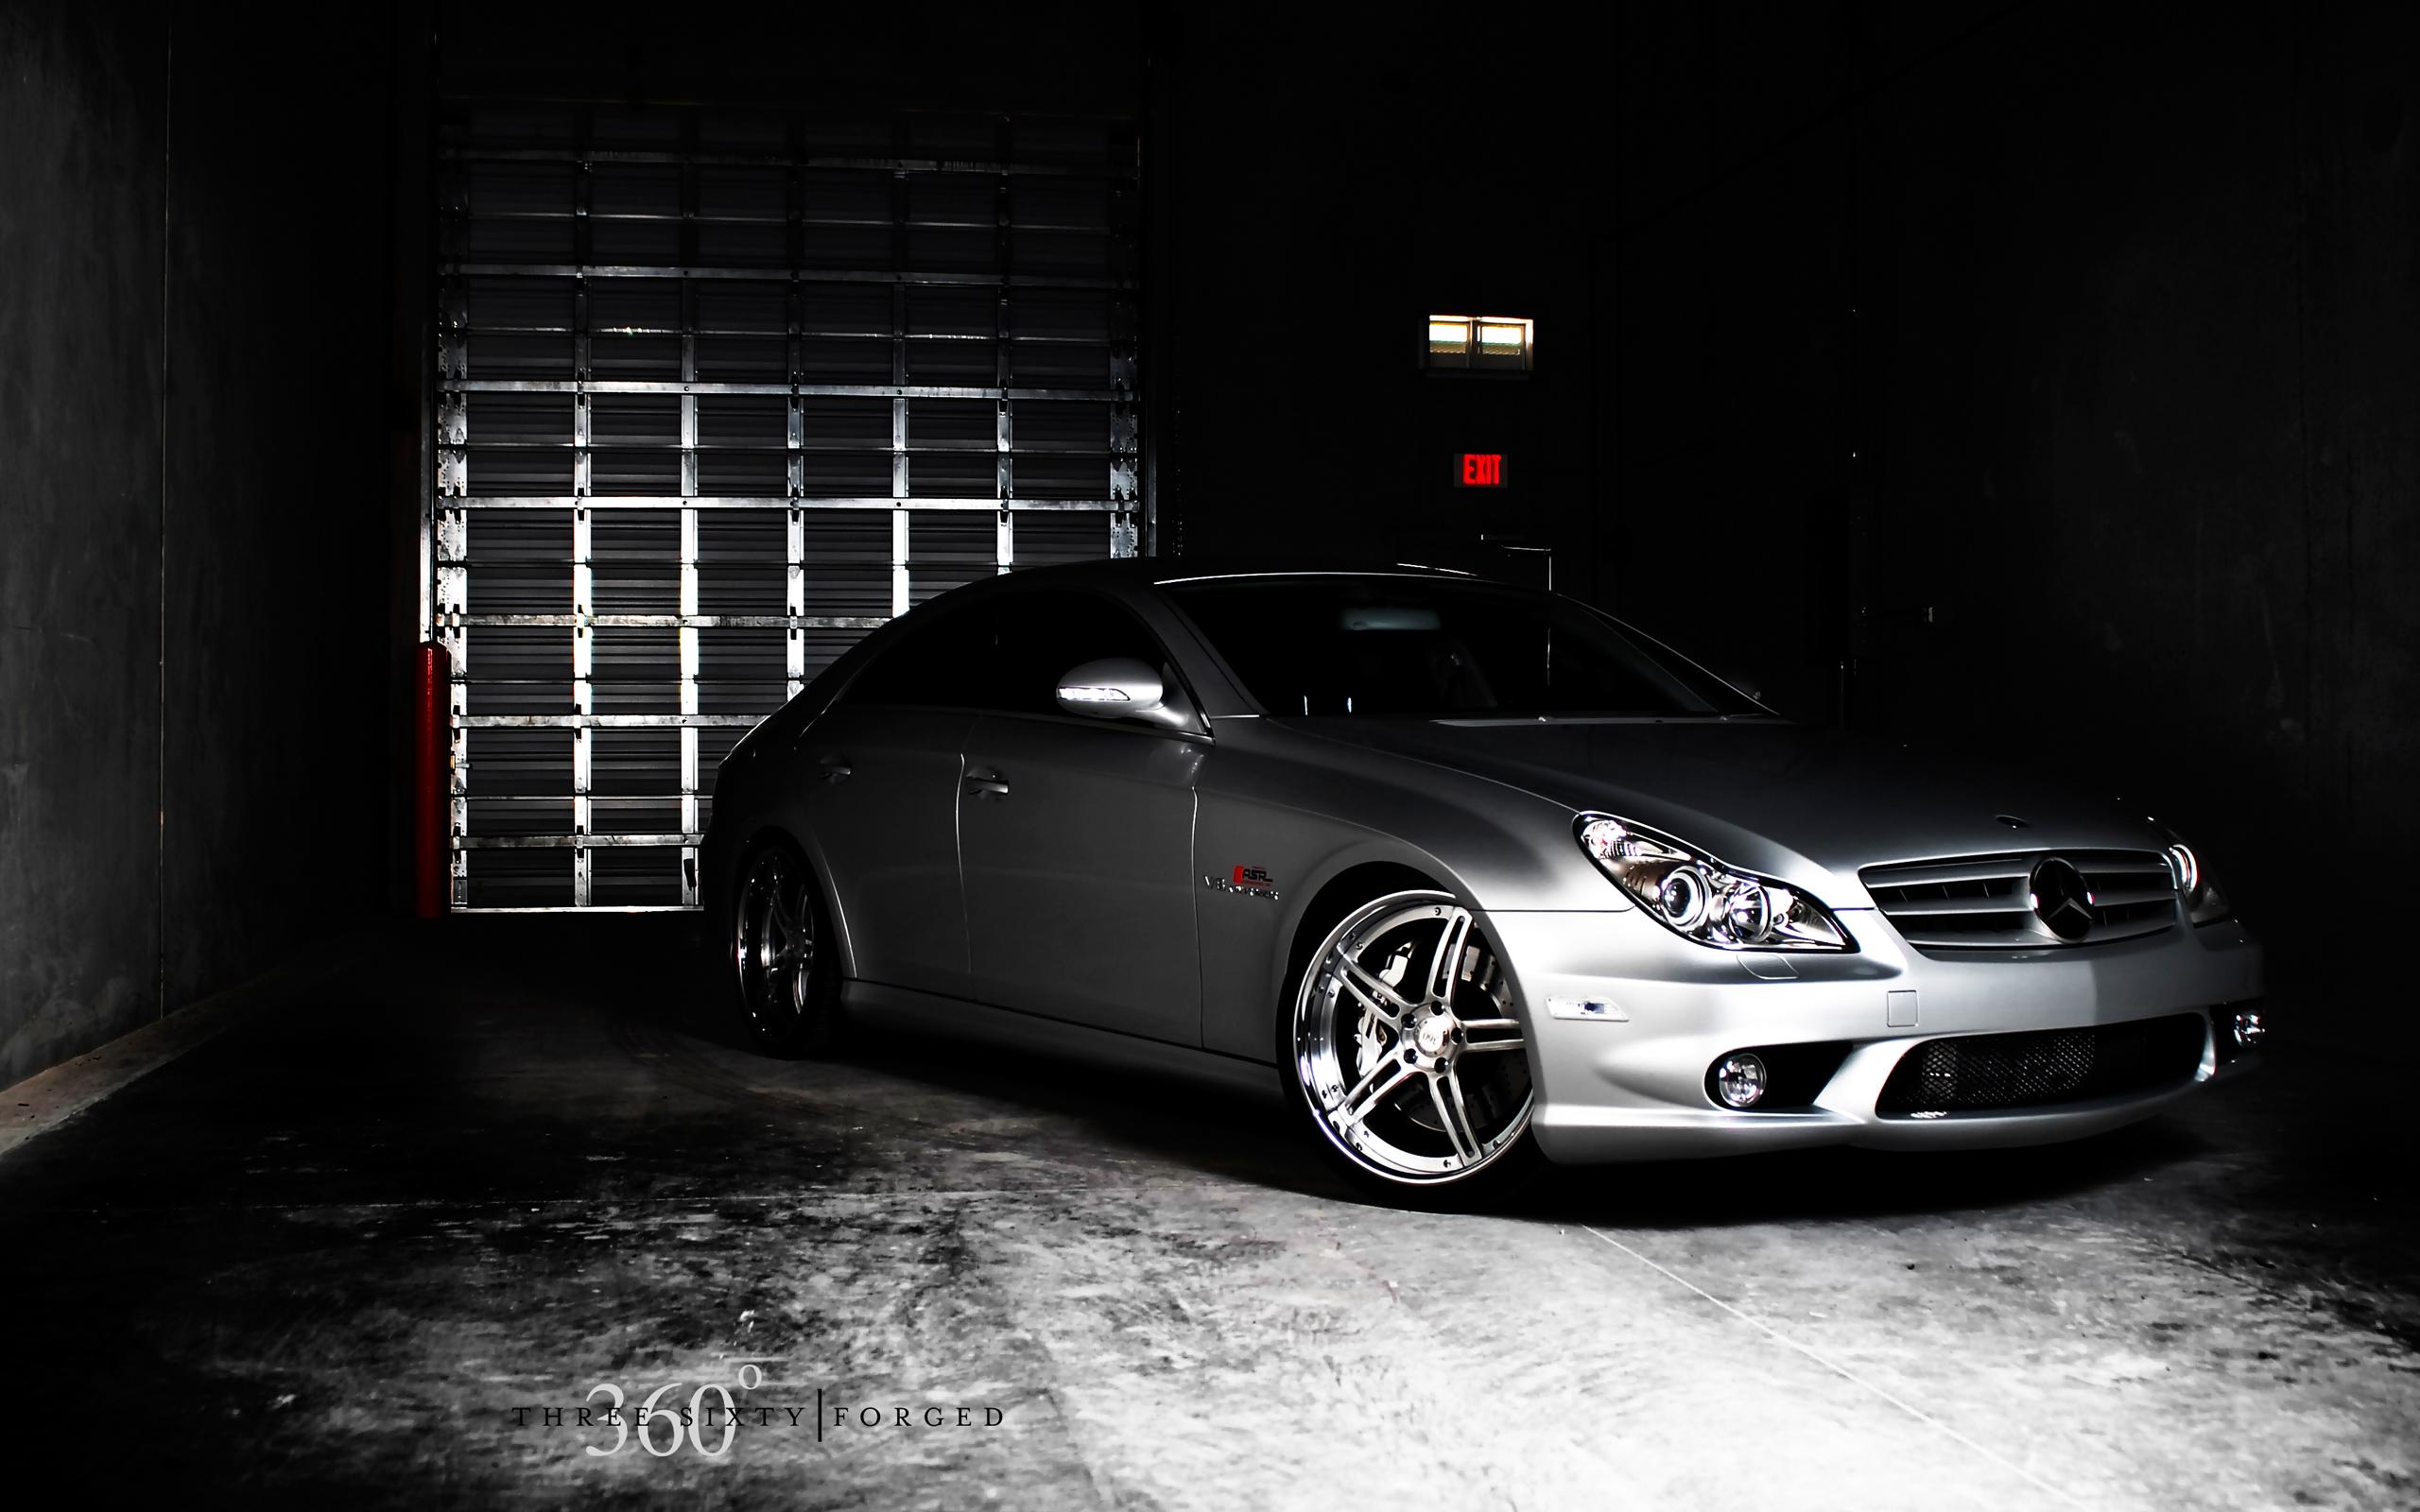 Mercedes Cls 55 360 Forged Spec 5ive 2 Wallpaper Hd Car